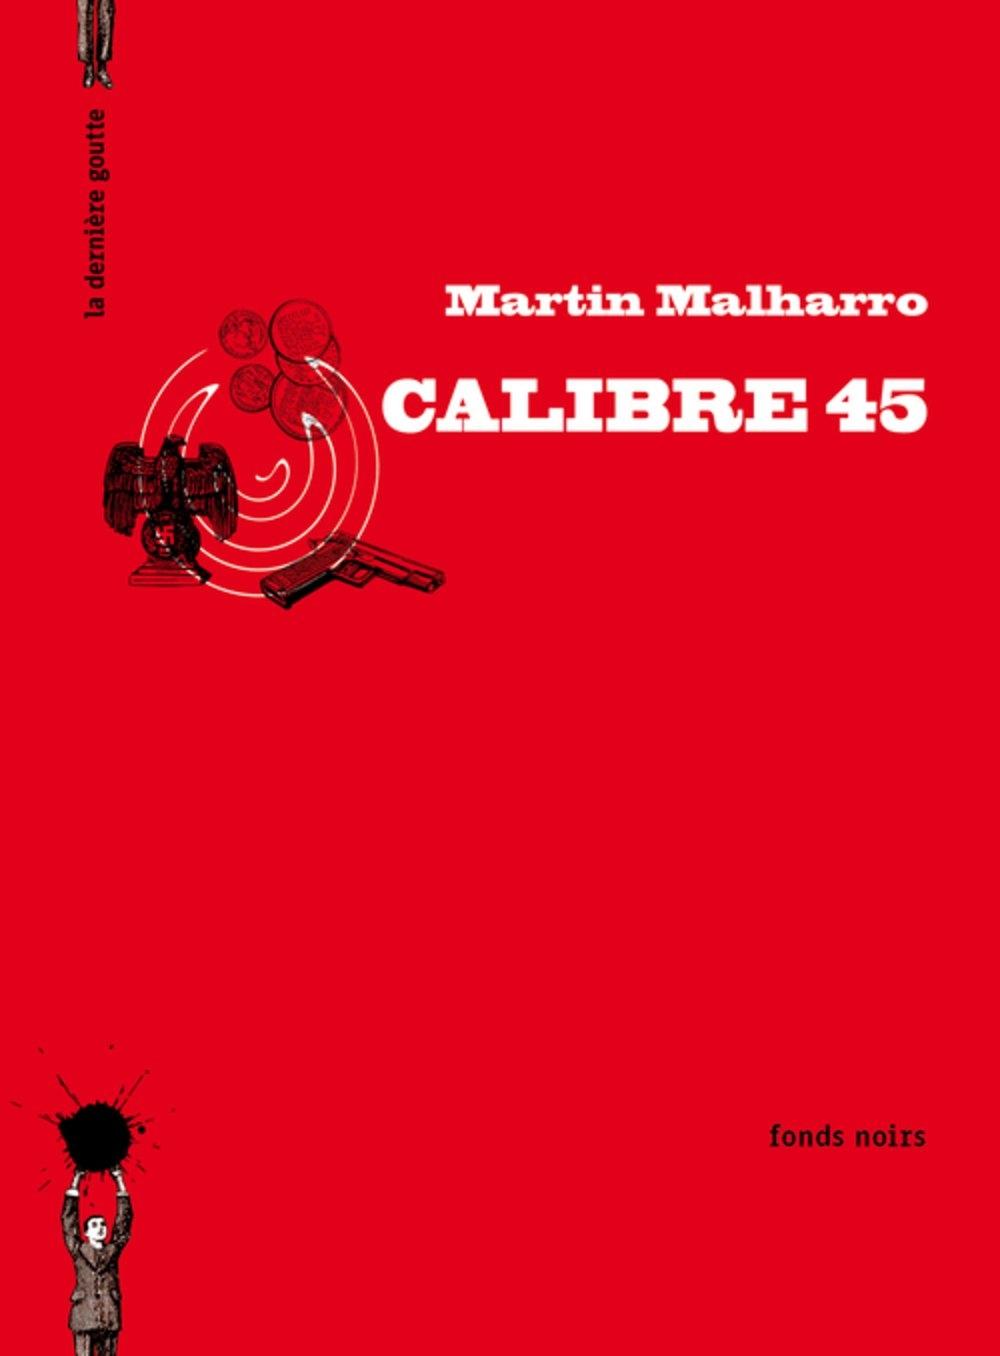 Martin Malharro